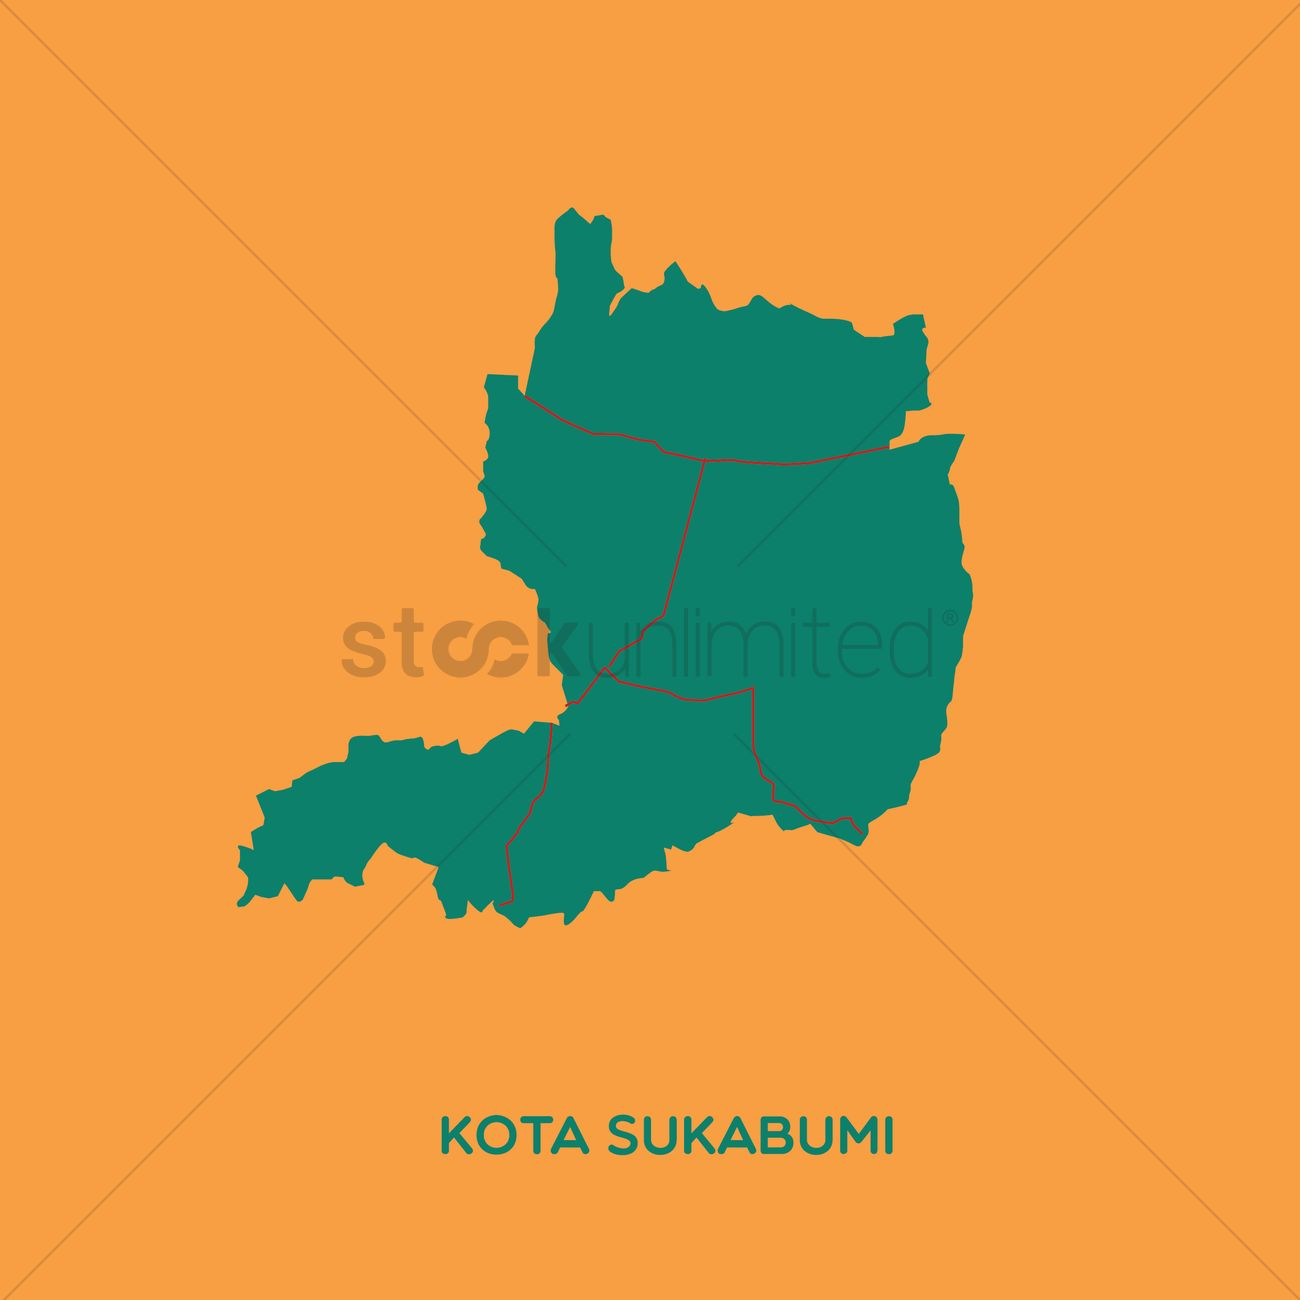 Map Of Kota Sukabumi Vector Image 1479785 Stockunlimited